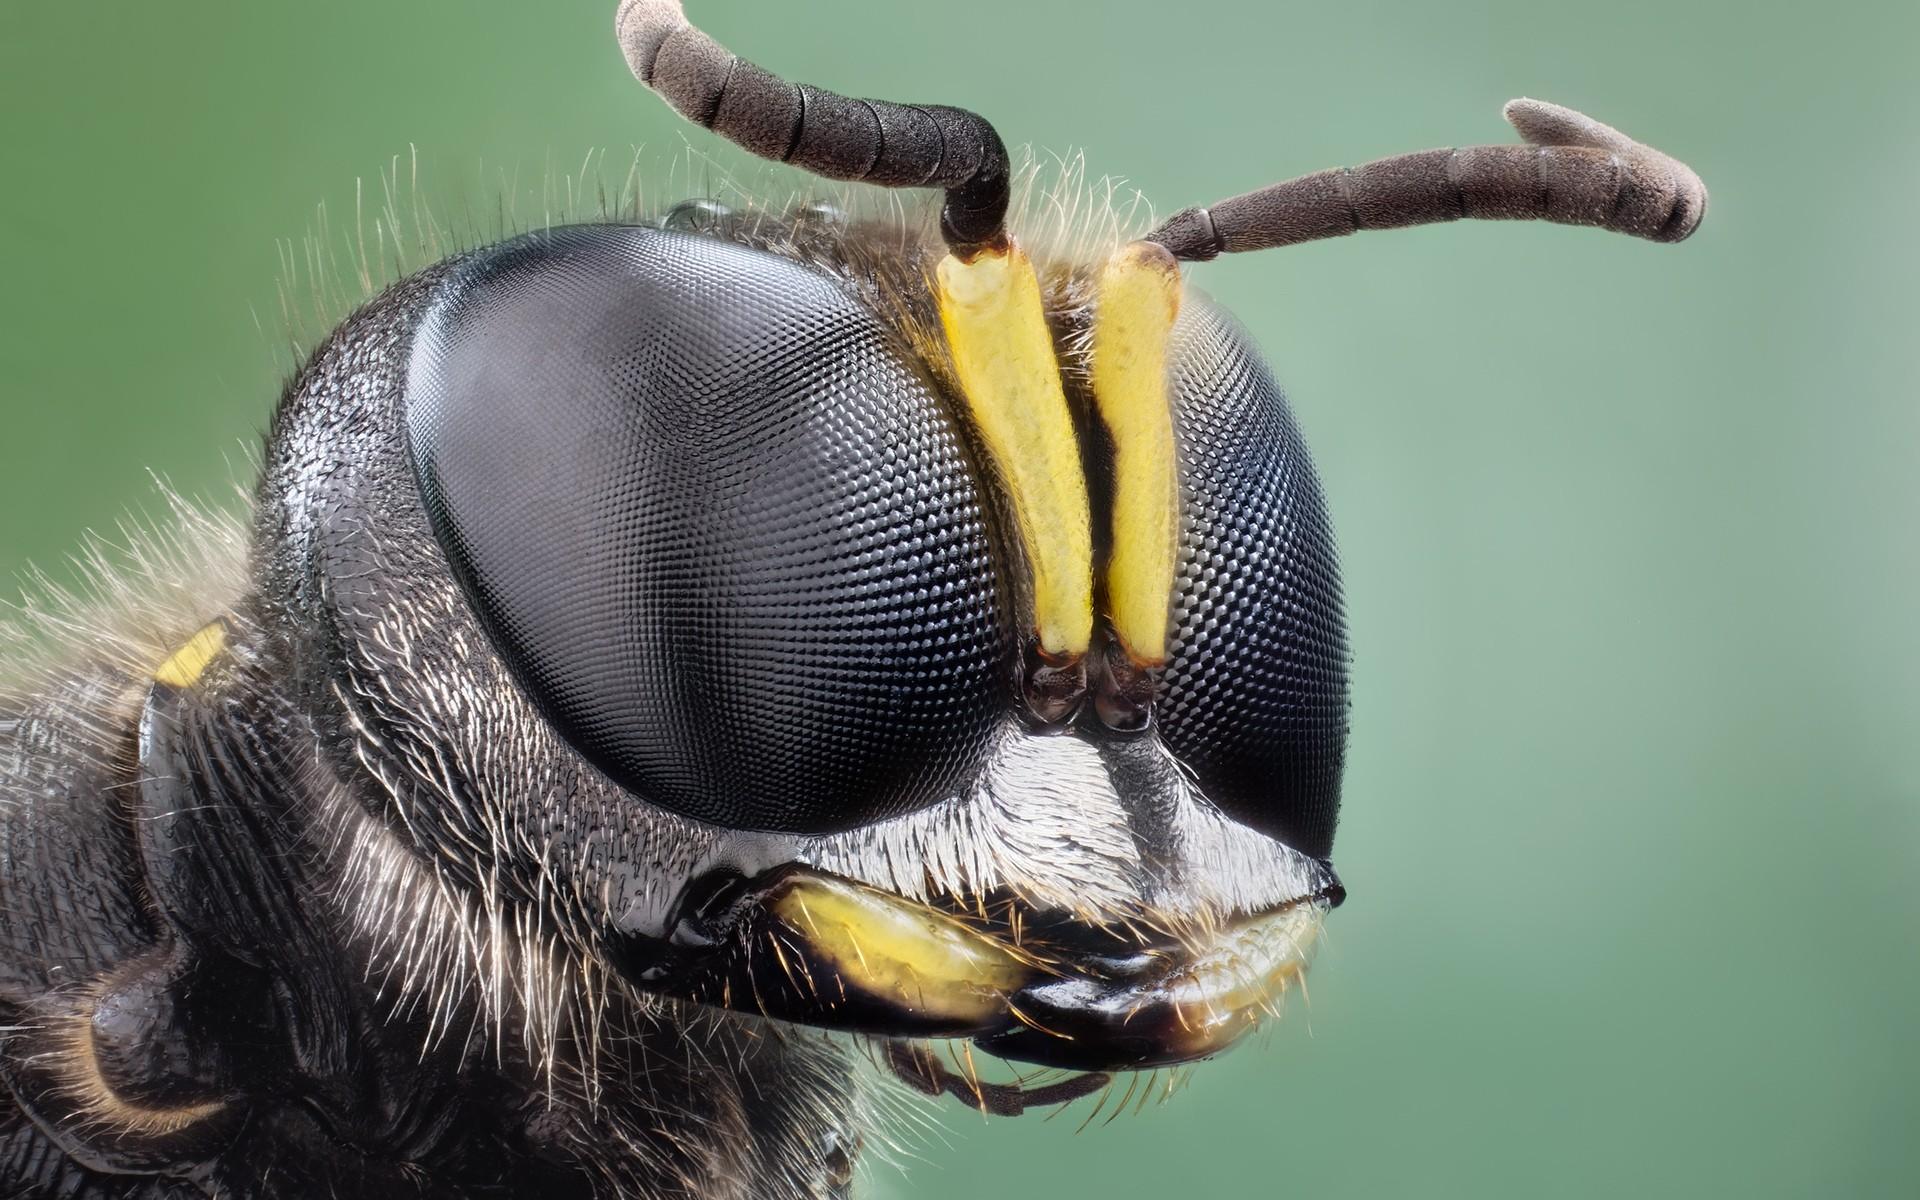 La cabeza de un insecto - 1920x1200